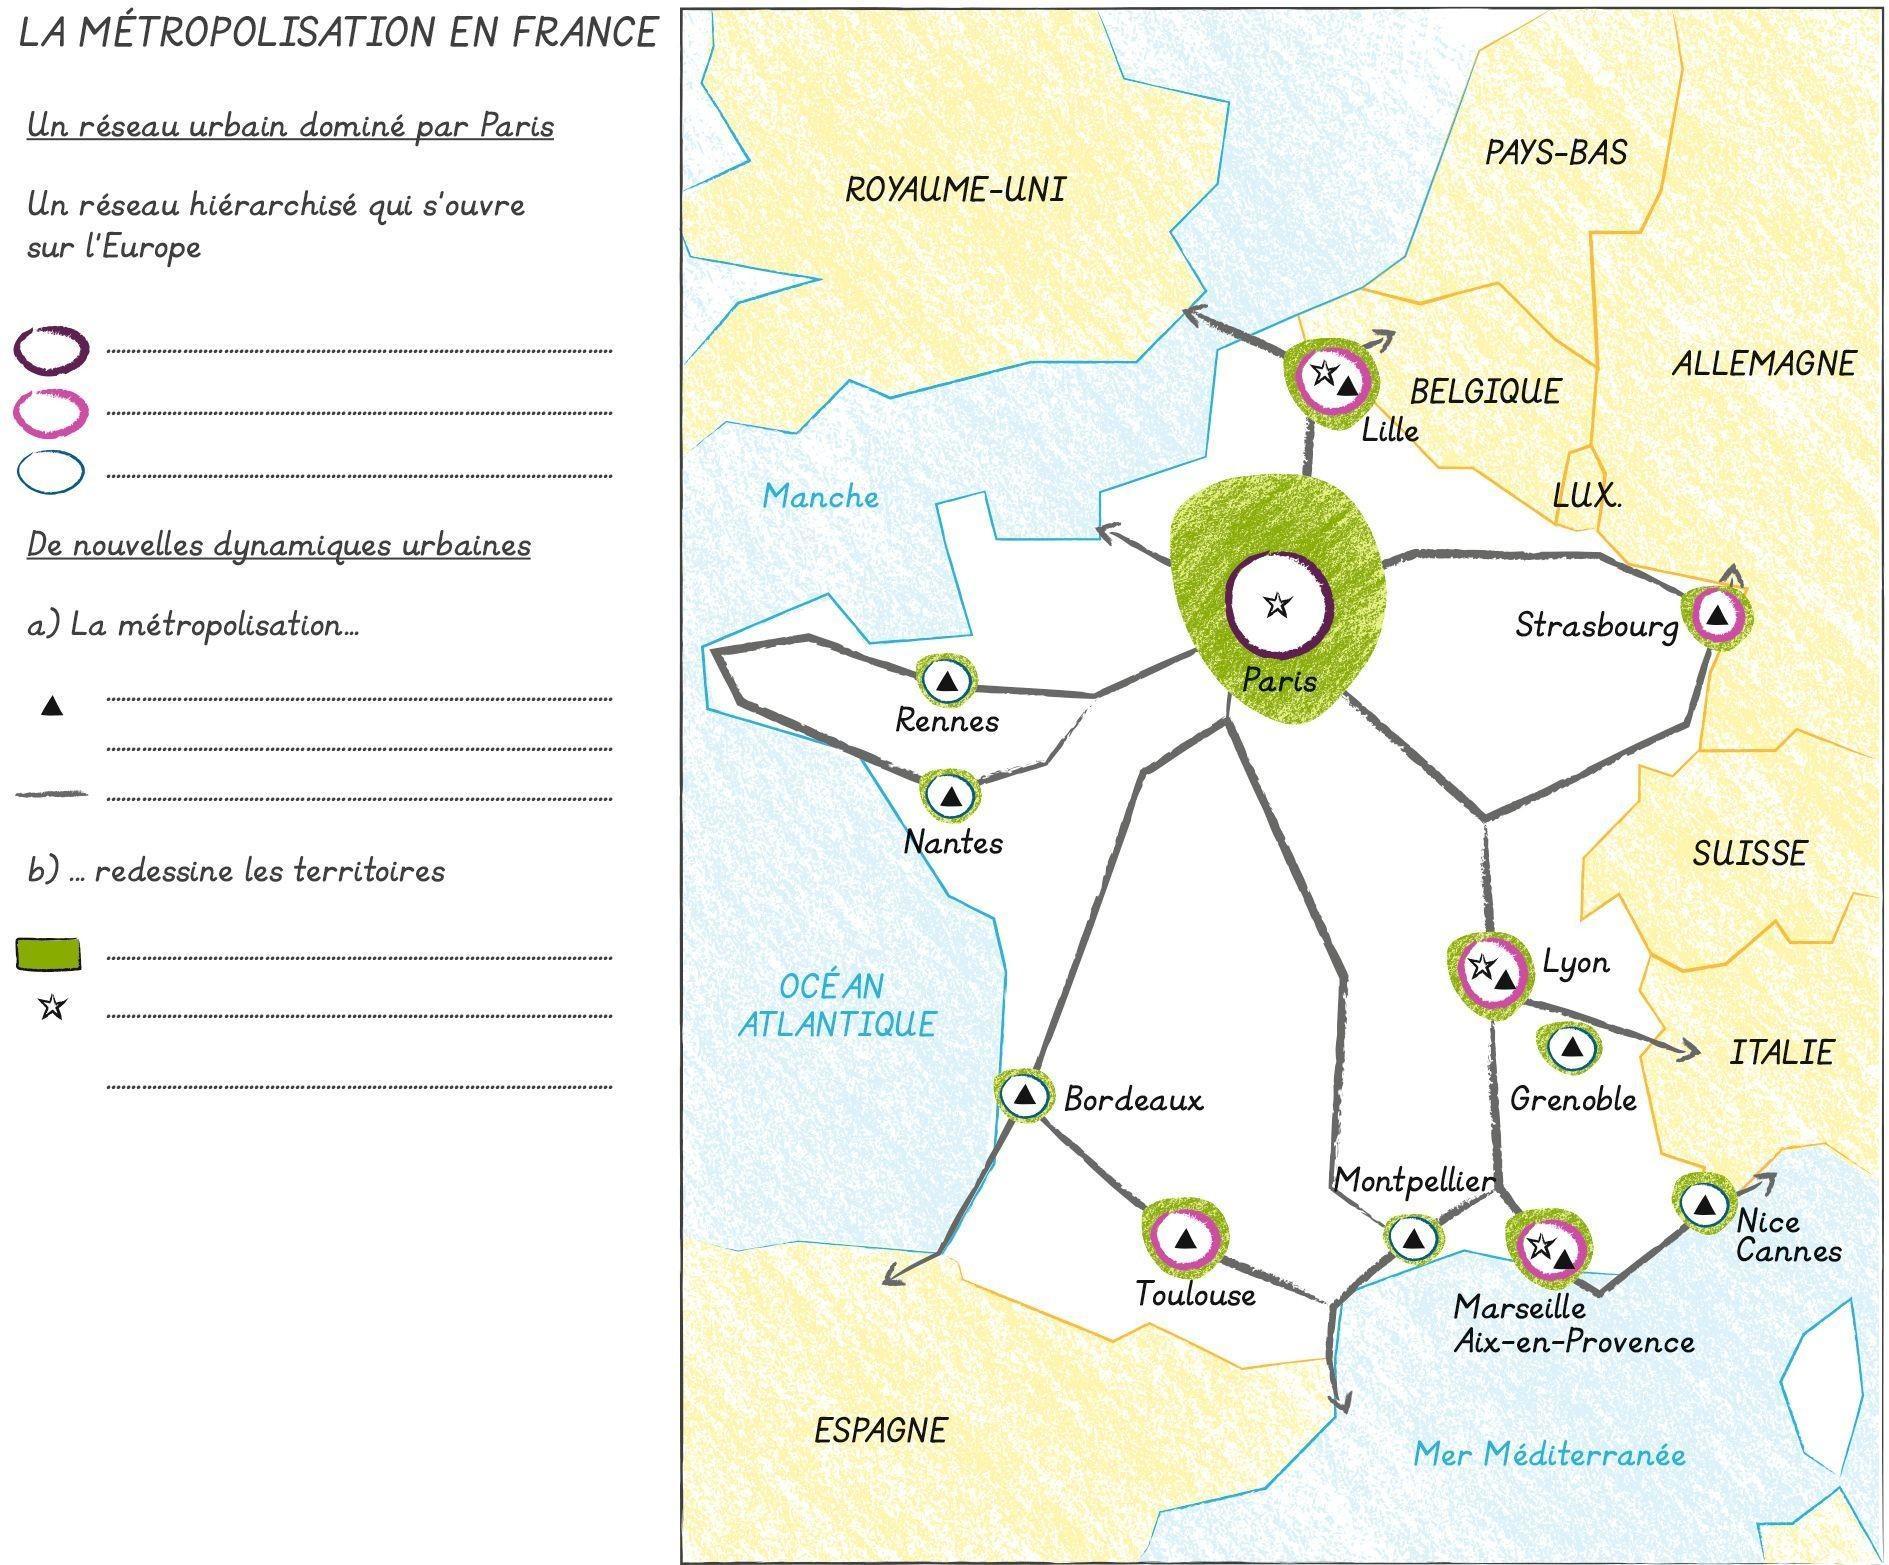 la métropolisation en France